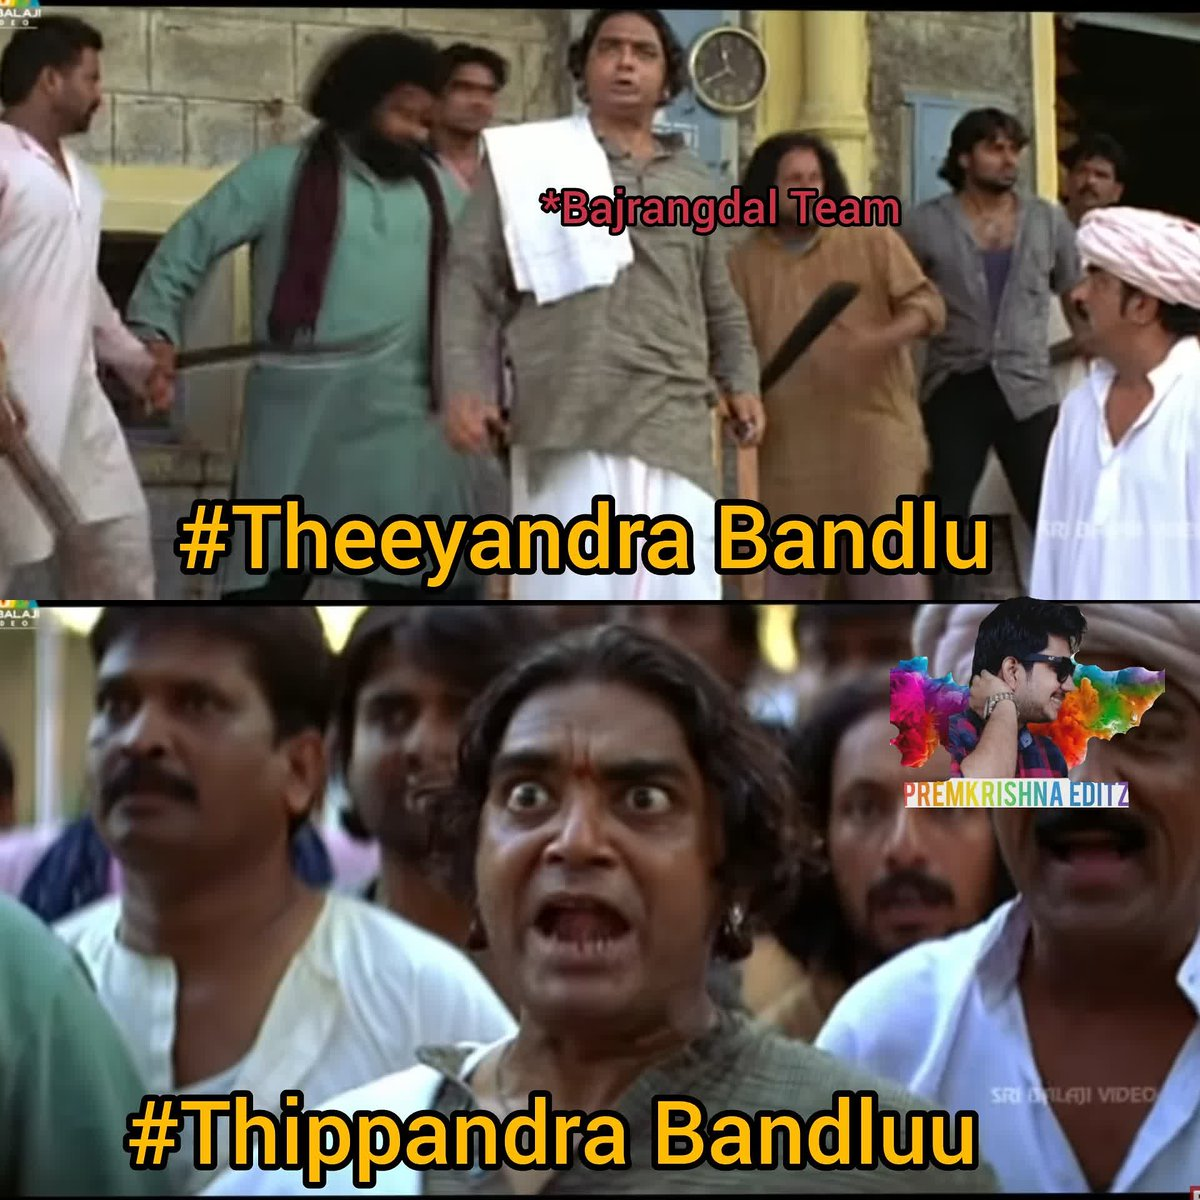 Like & follow for more fun#Crickettrolls #telugutrolls #tamiltrolls #tamilcomedy #telugucomedy #telugumemes #teluguedits #funnyedits #telugucomedy #trending #bestmemes #jabardasth #adhirindhi #trending #telugucomedy #telugumemes #singlepic.twitter.com/FWBeBySiOR